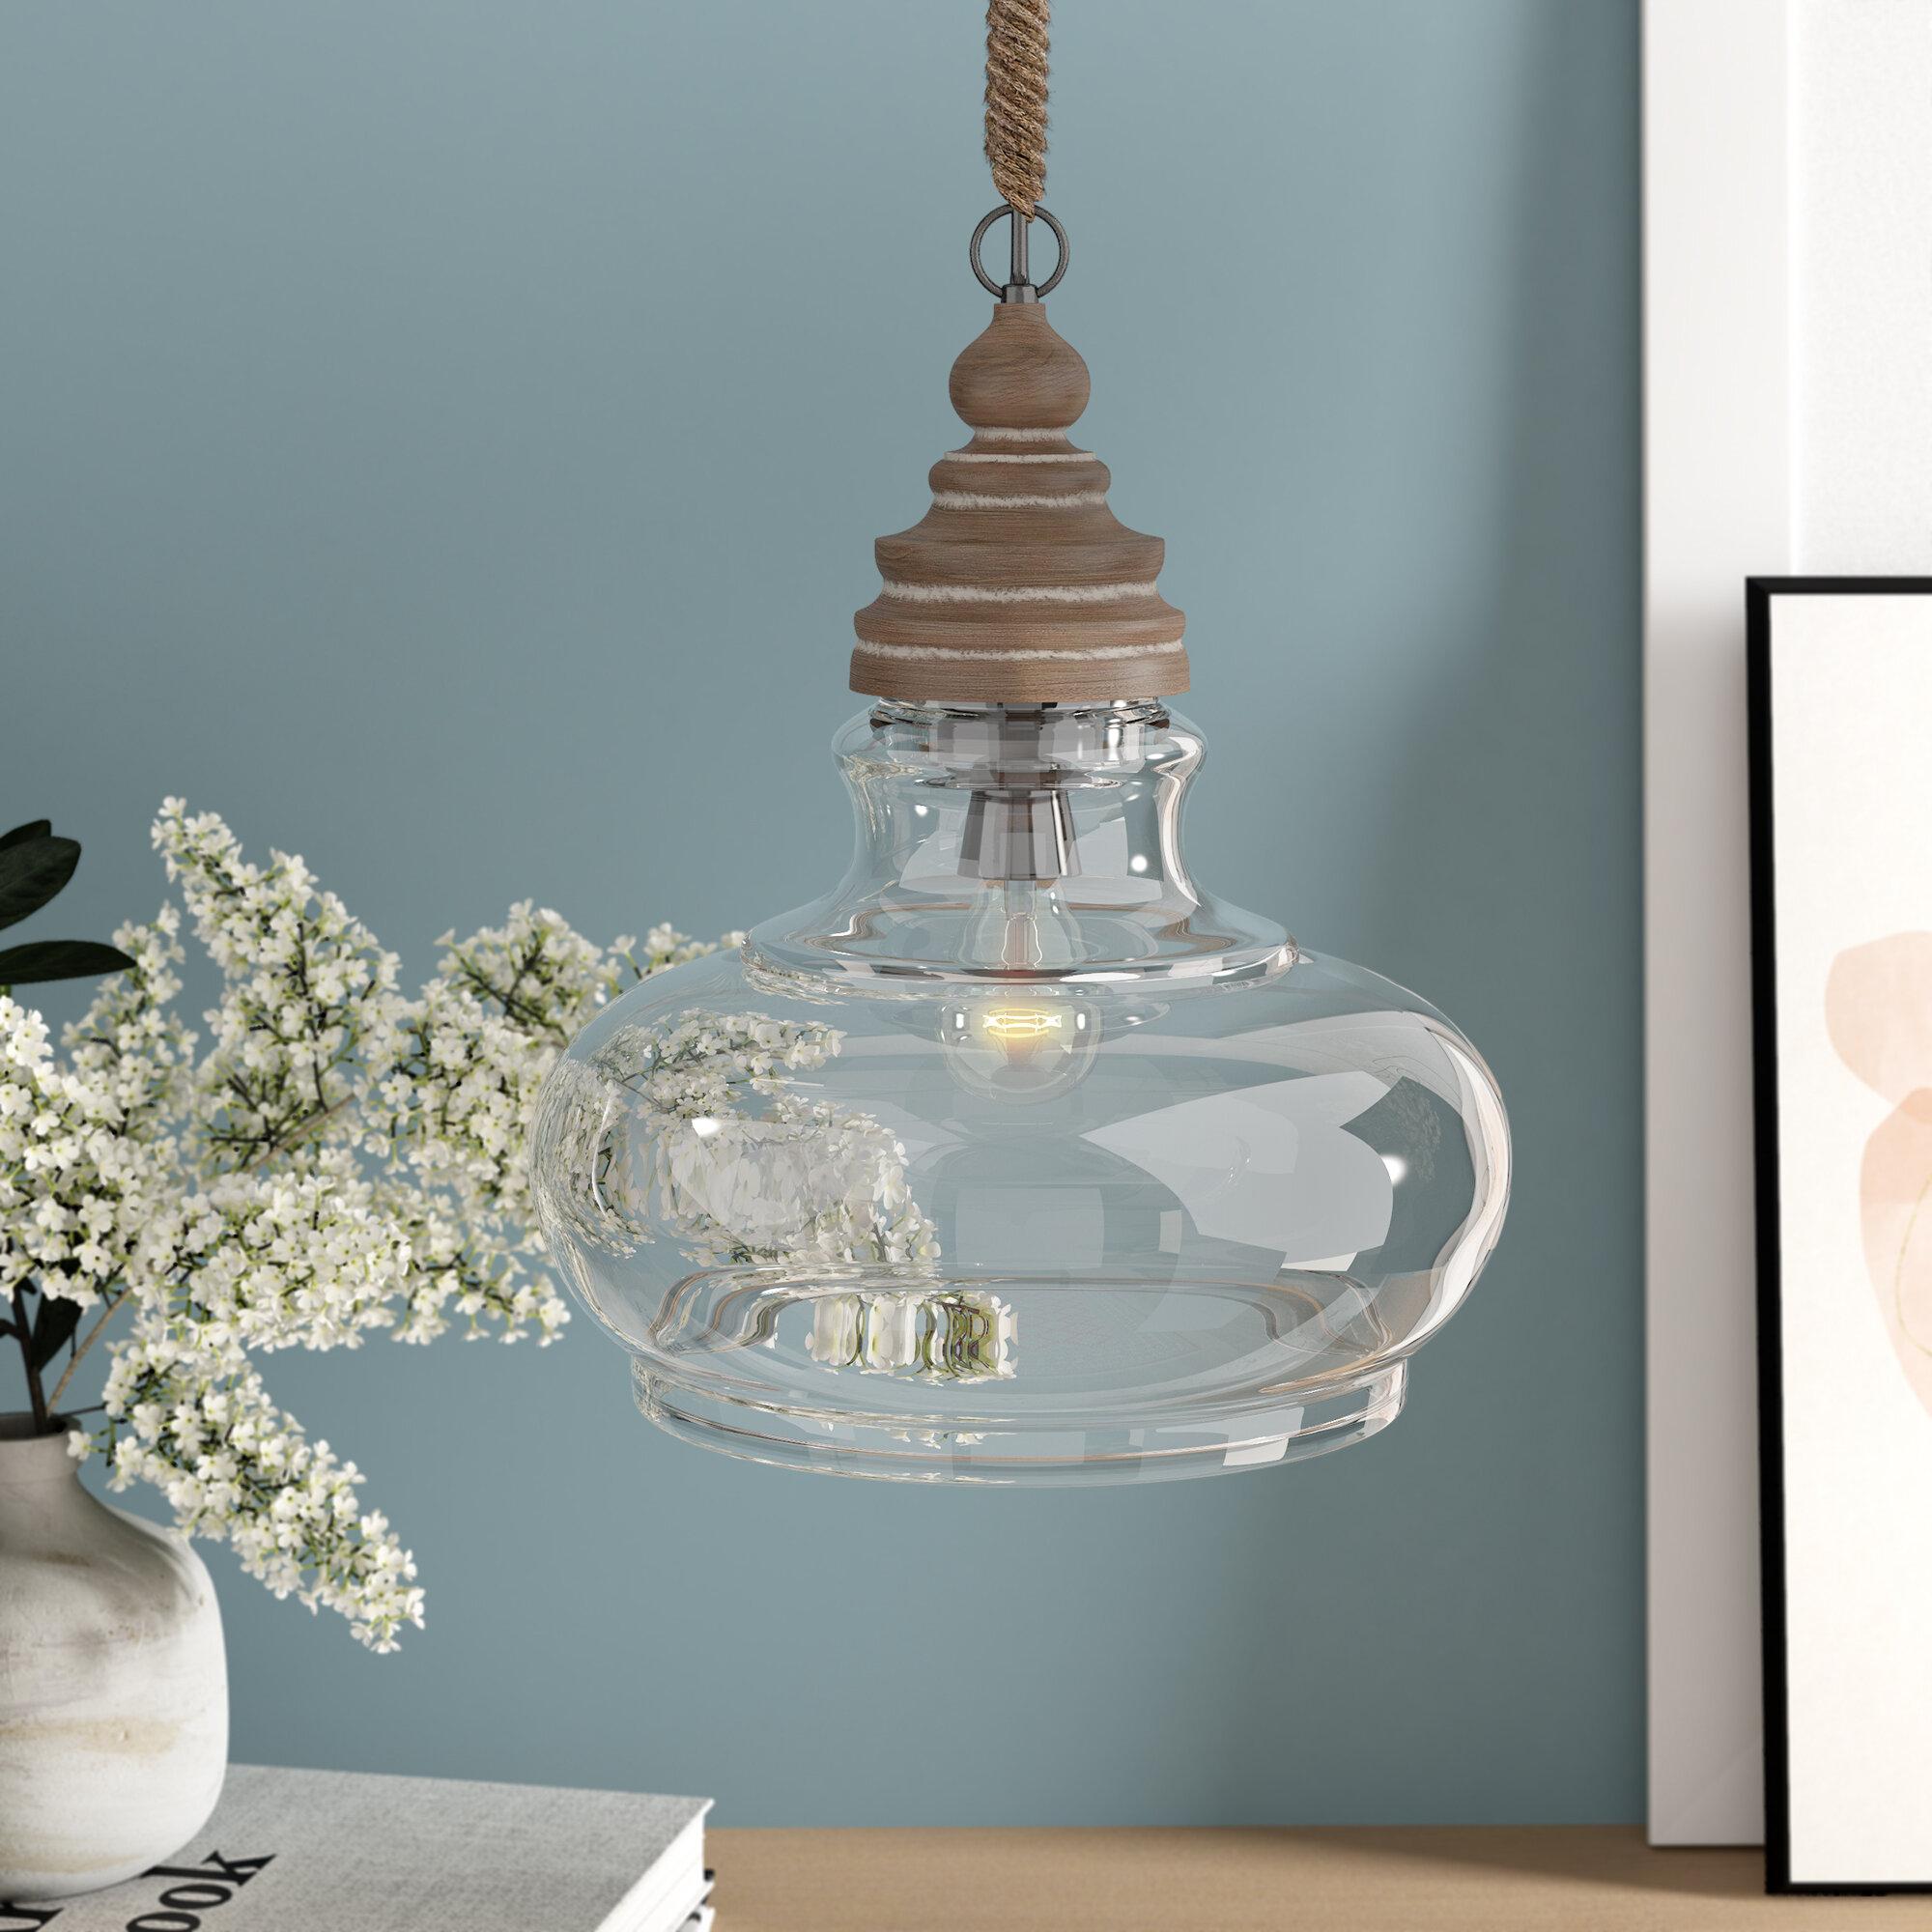 Maelle 1 Light Single Bell Pendant With Akakios 1 Light Single Bell Pendants (Image 20 of 30)